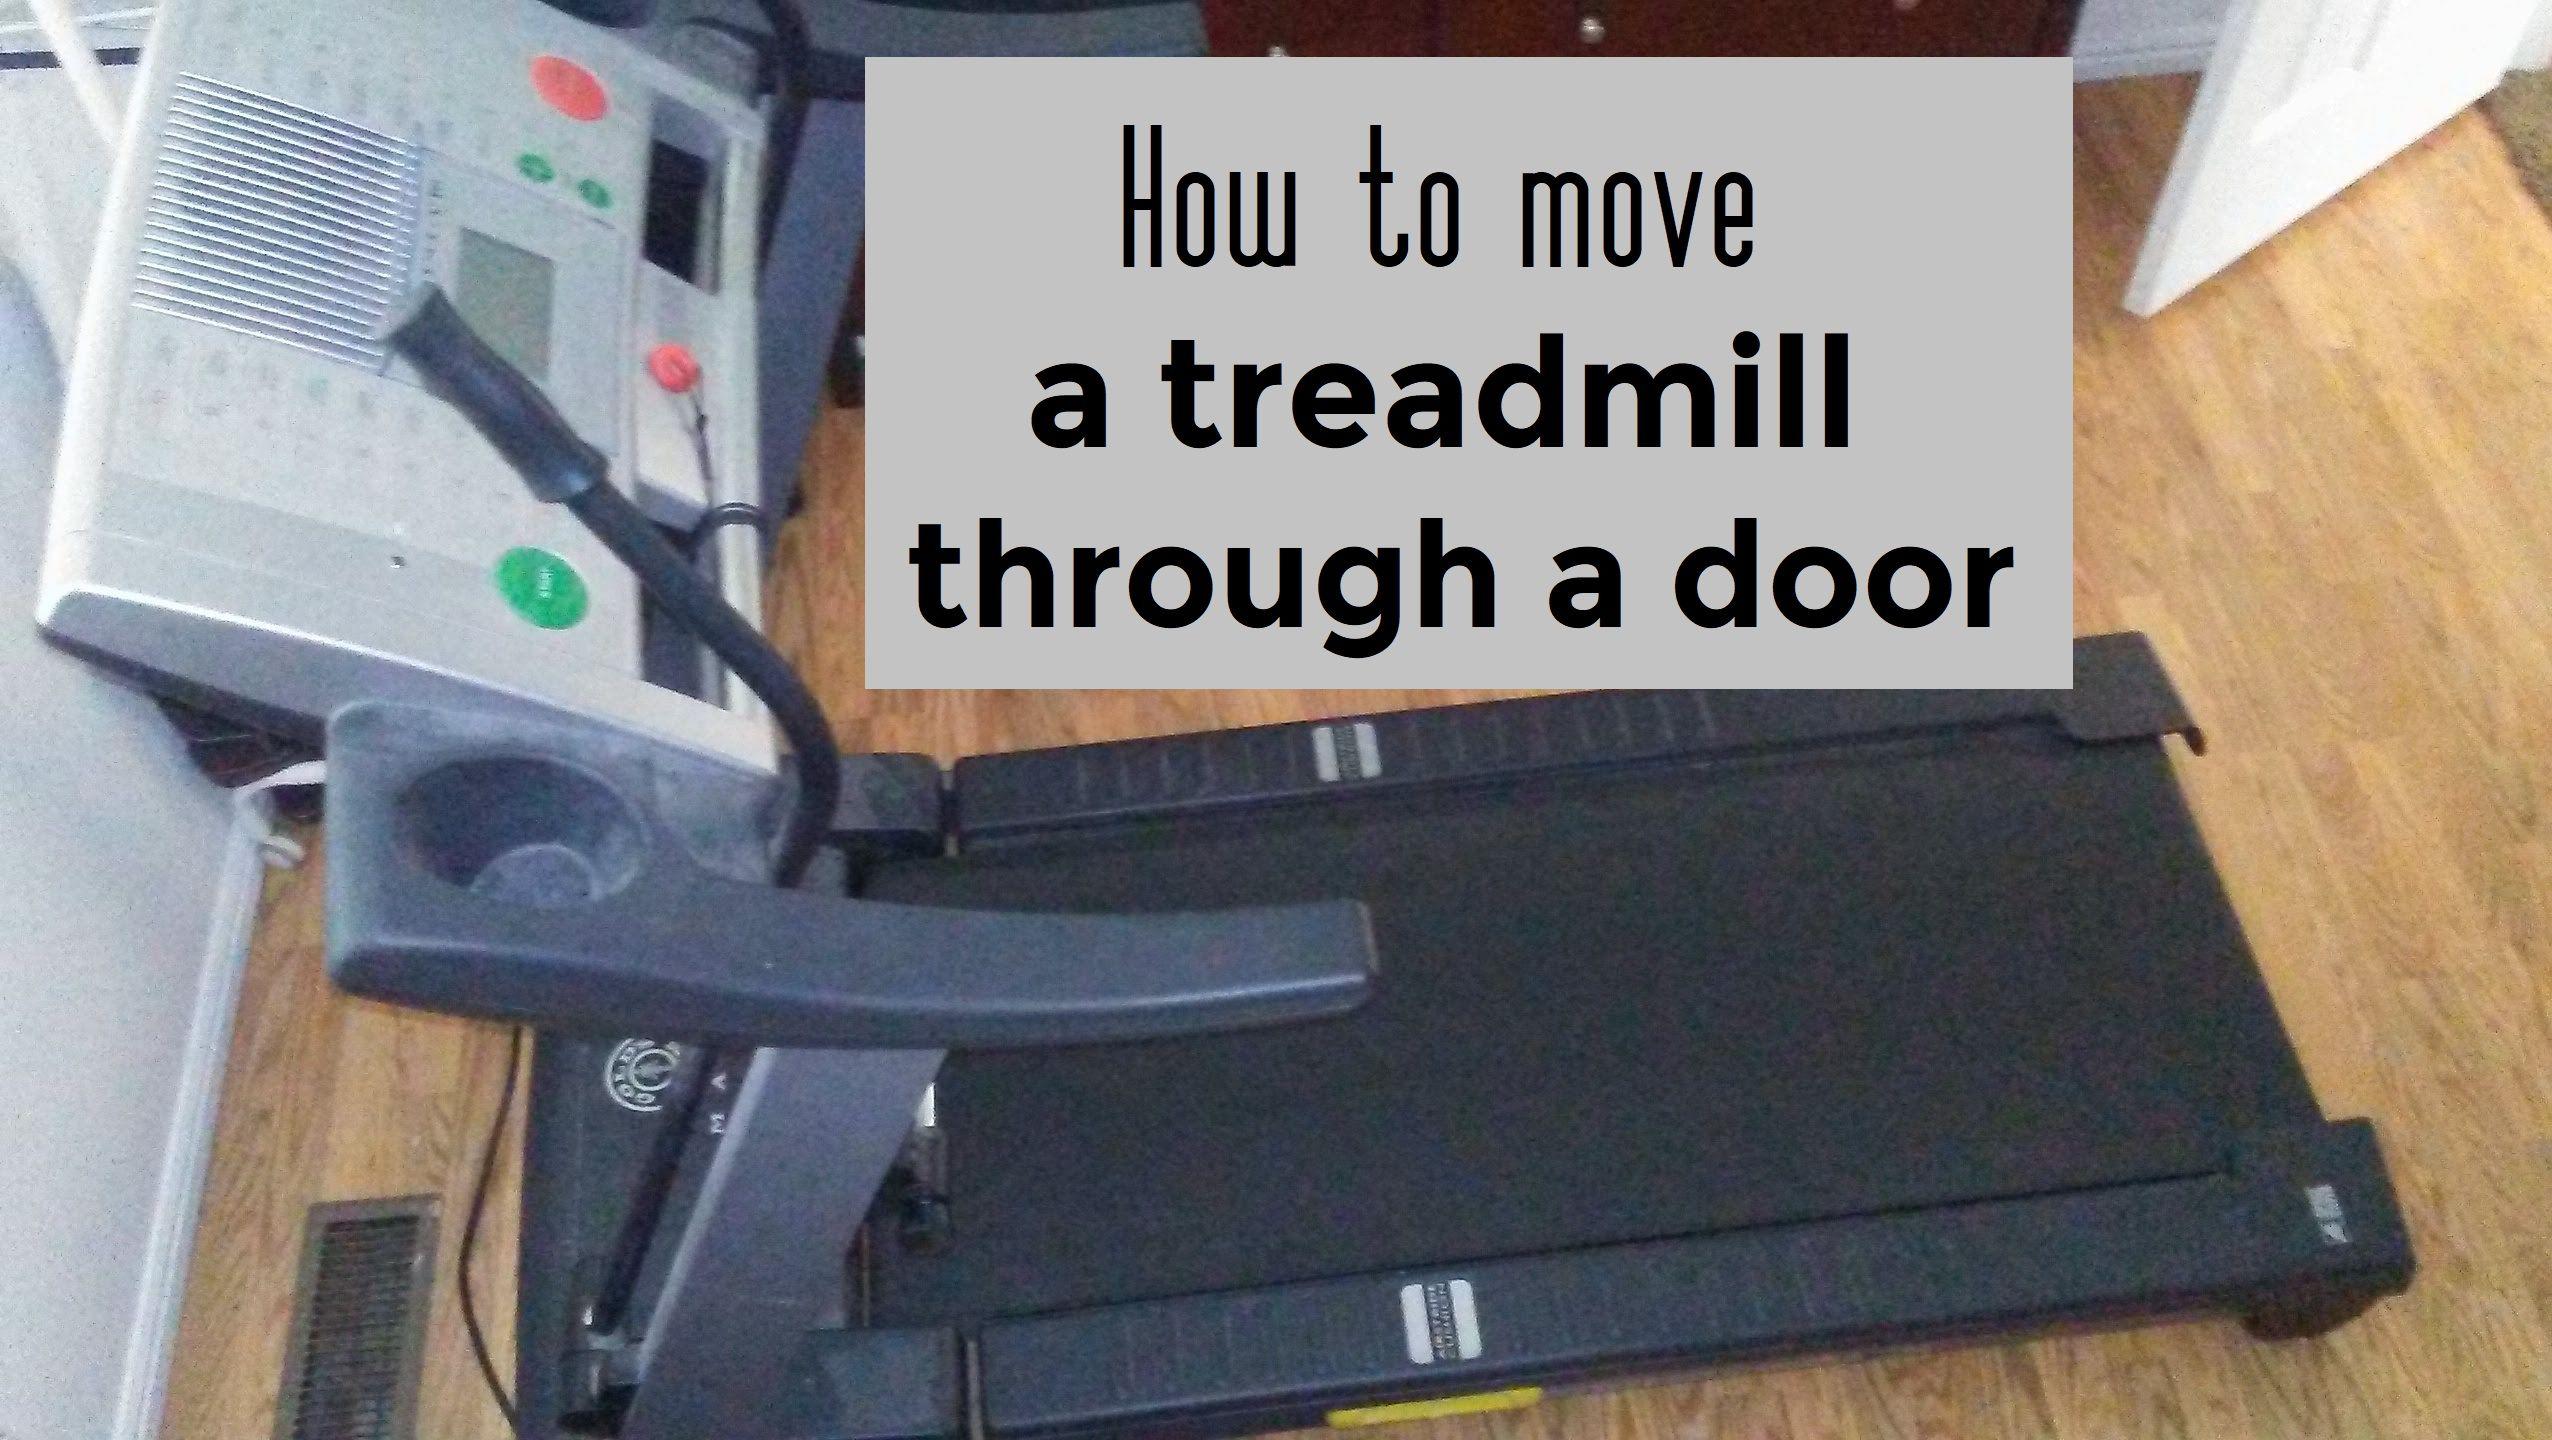 How to move a treadmill through a door way Home repair